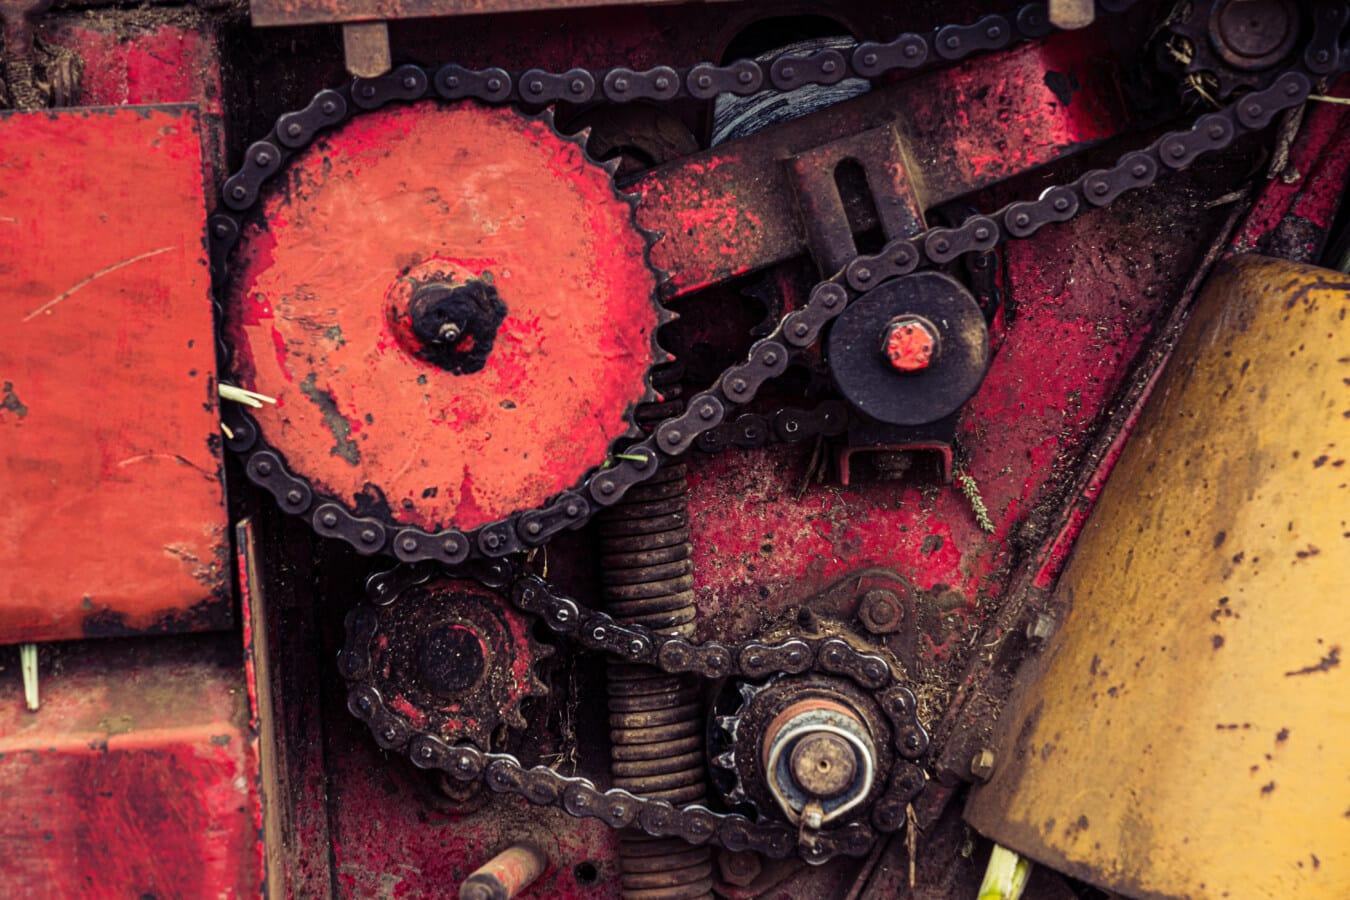 Übertragung, Mechanismus, Mechaniker, Mechanisierung, Getriebe, Metallgetriebe, Metall, Kette, alt, Eisen